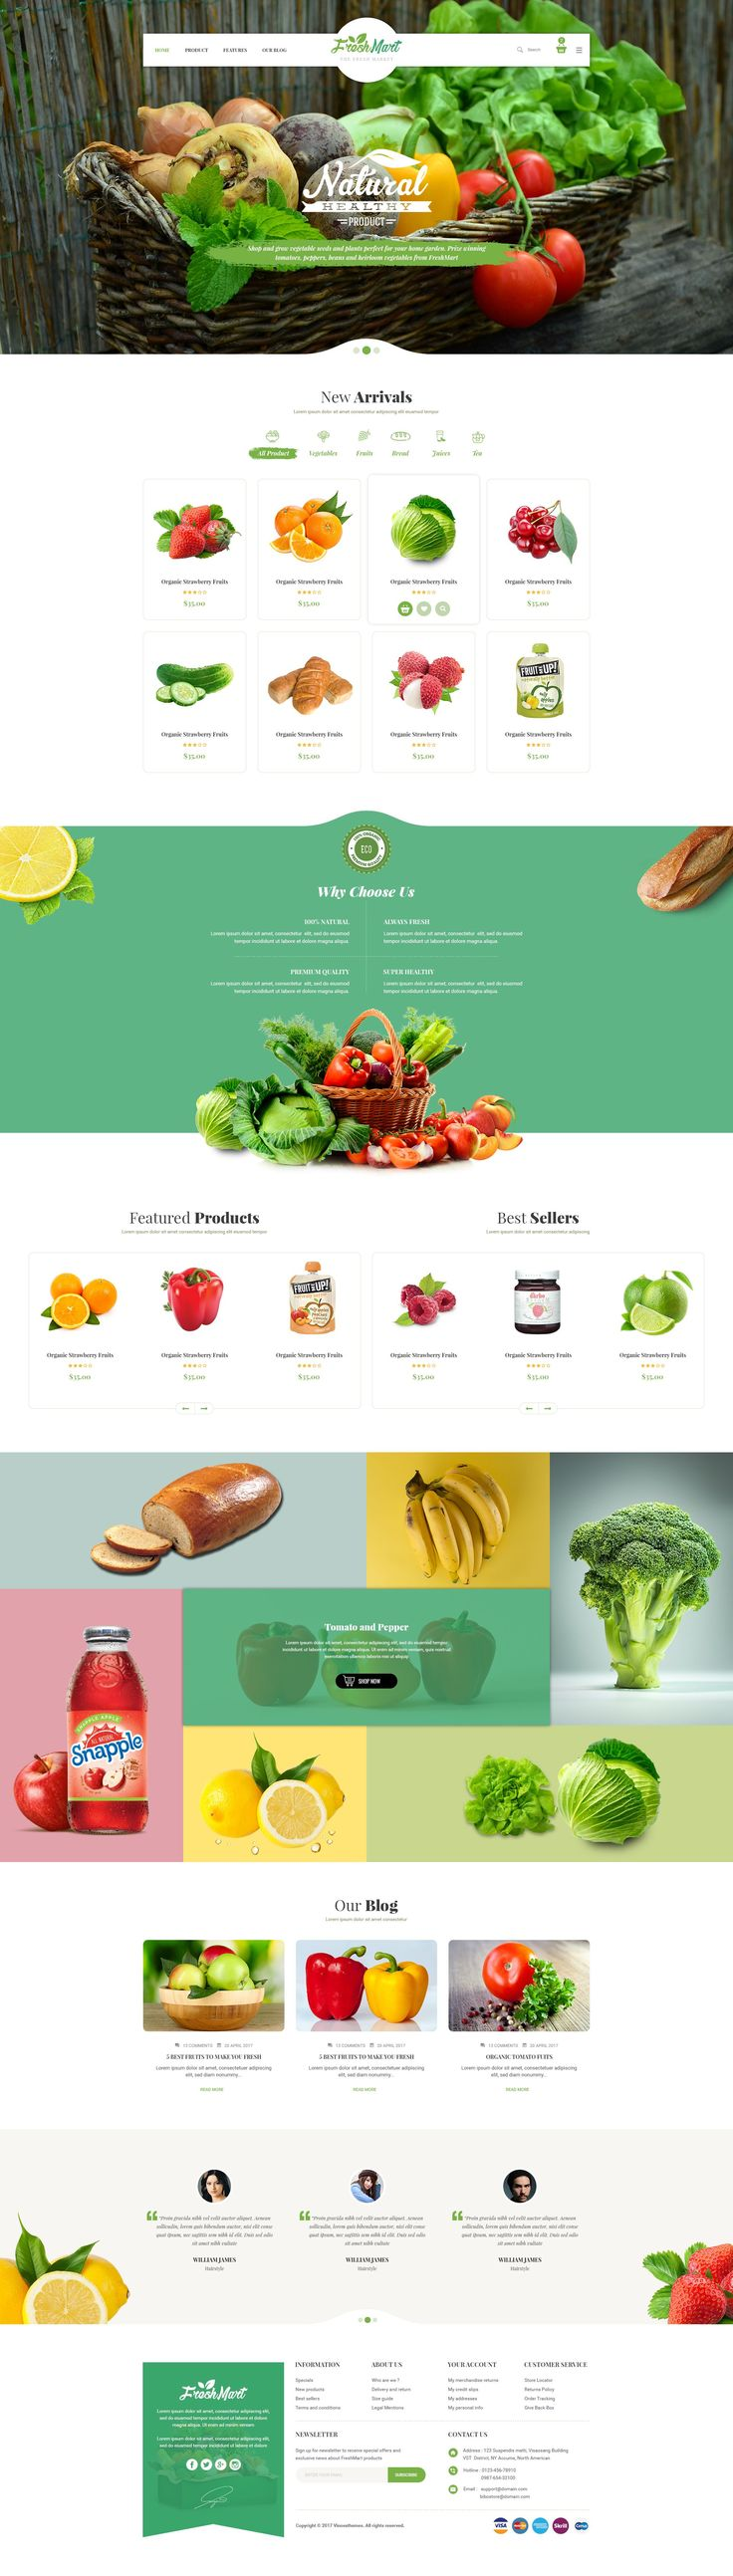 FreshMart - Organic Food PSD Template #organic food #shop #shopping • Download ➝ https://themeforest.net/item/freshmart-organic-food-psd-template/20095556?ref=pxcr #OrganicFoodWebsite